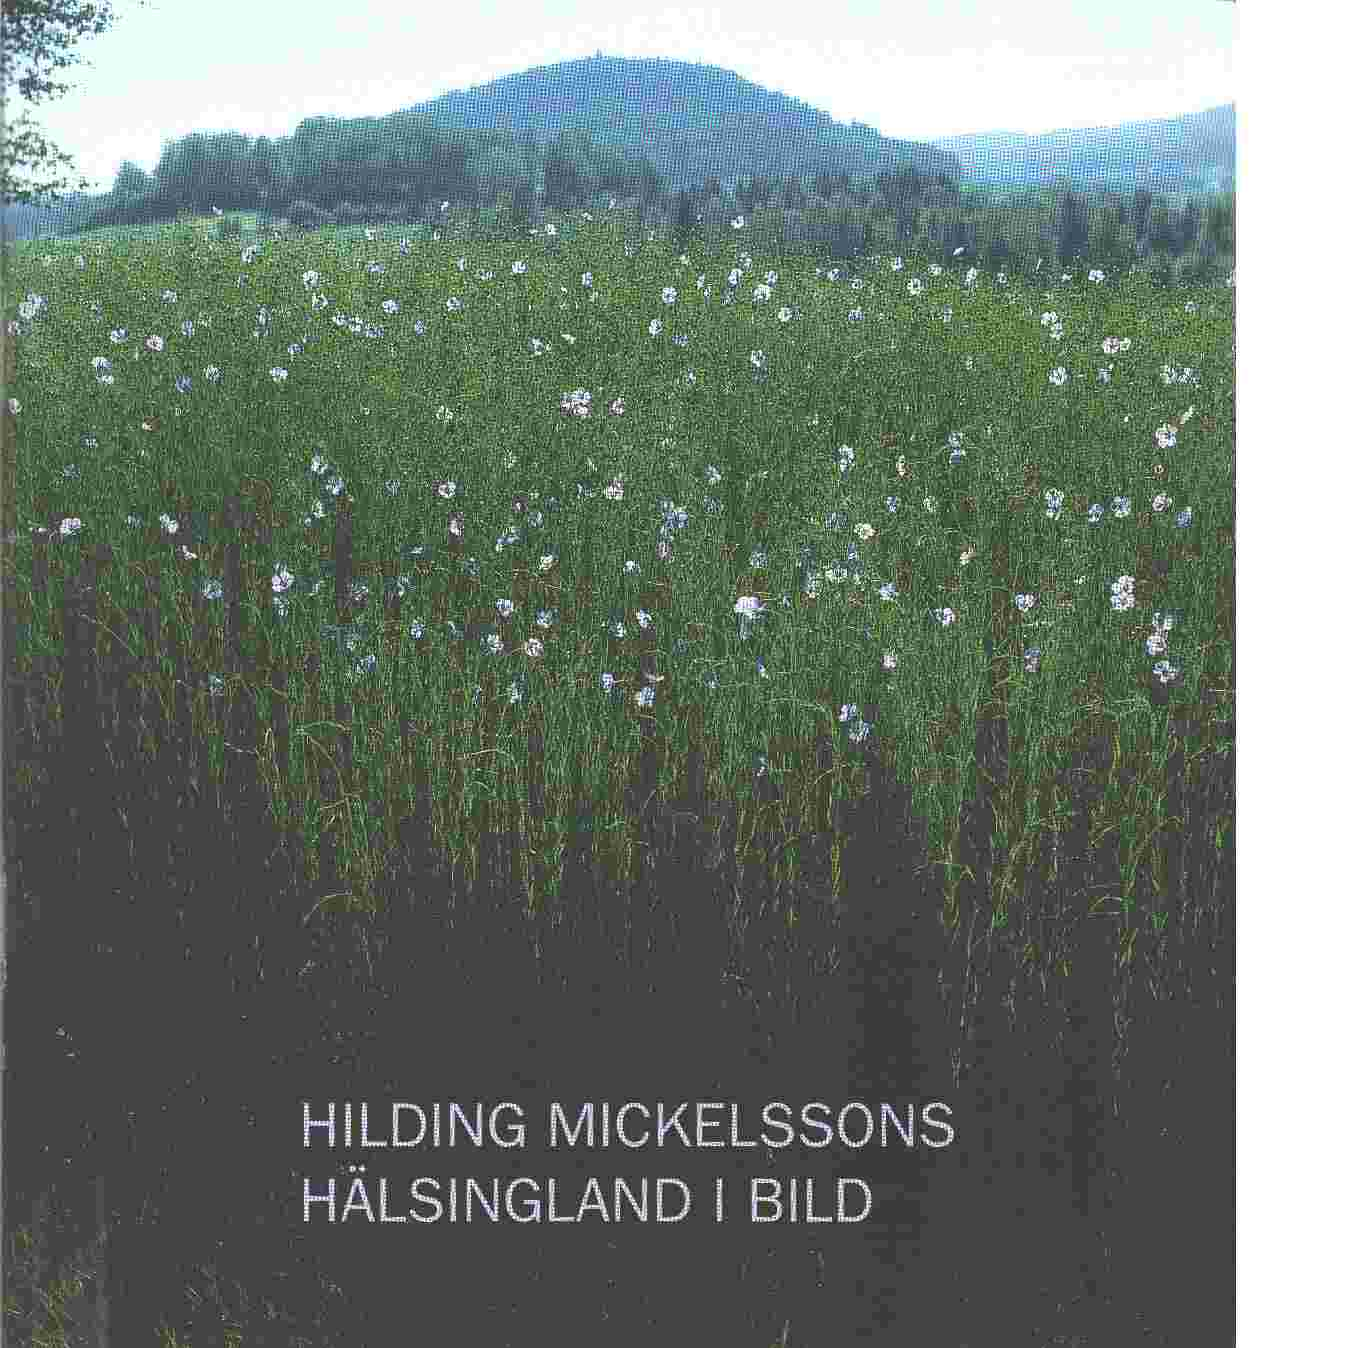 Hilding Mickelssons Hälsingland i bild - Mickelsson, Hilding